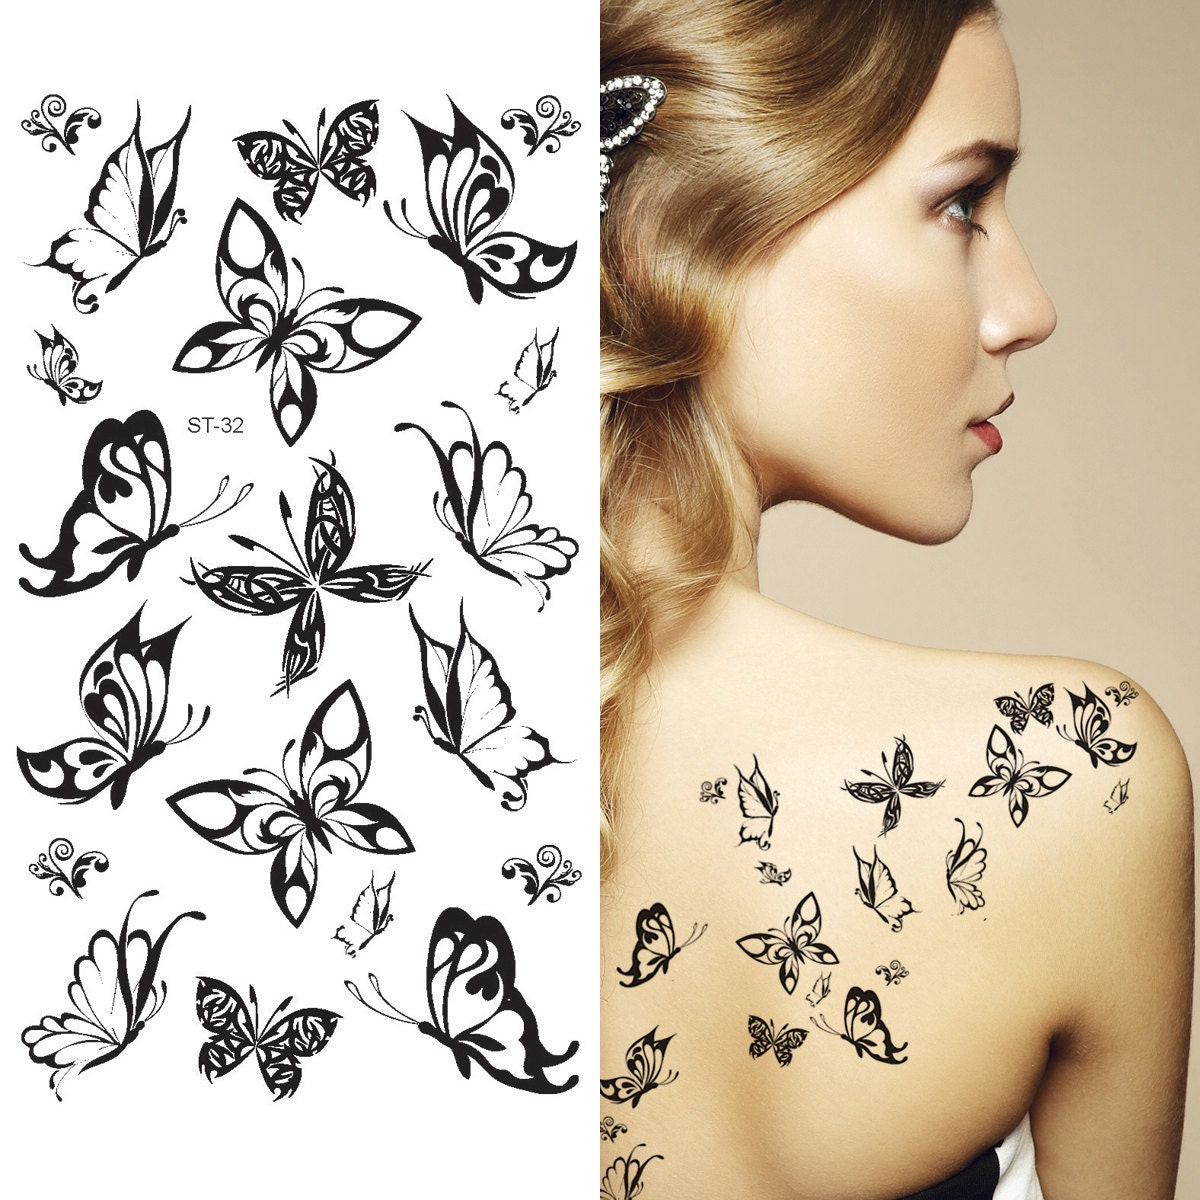 Supperb® Temporary Tattoos Small Black Butterflies